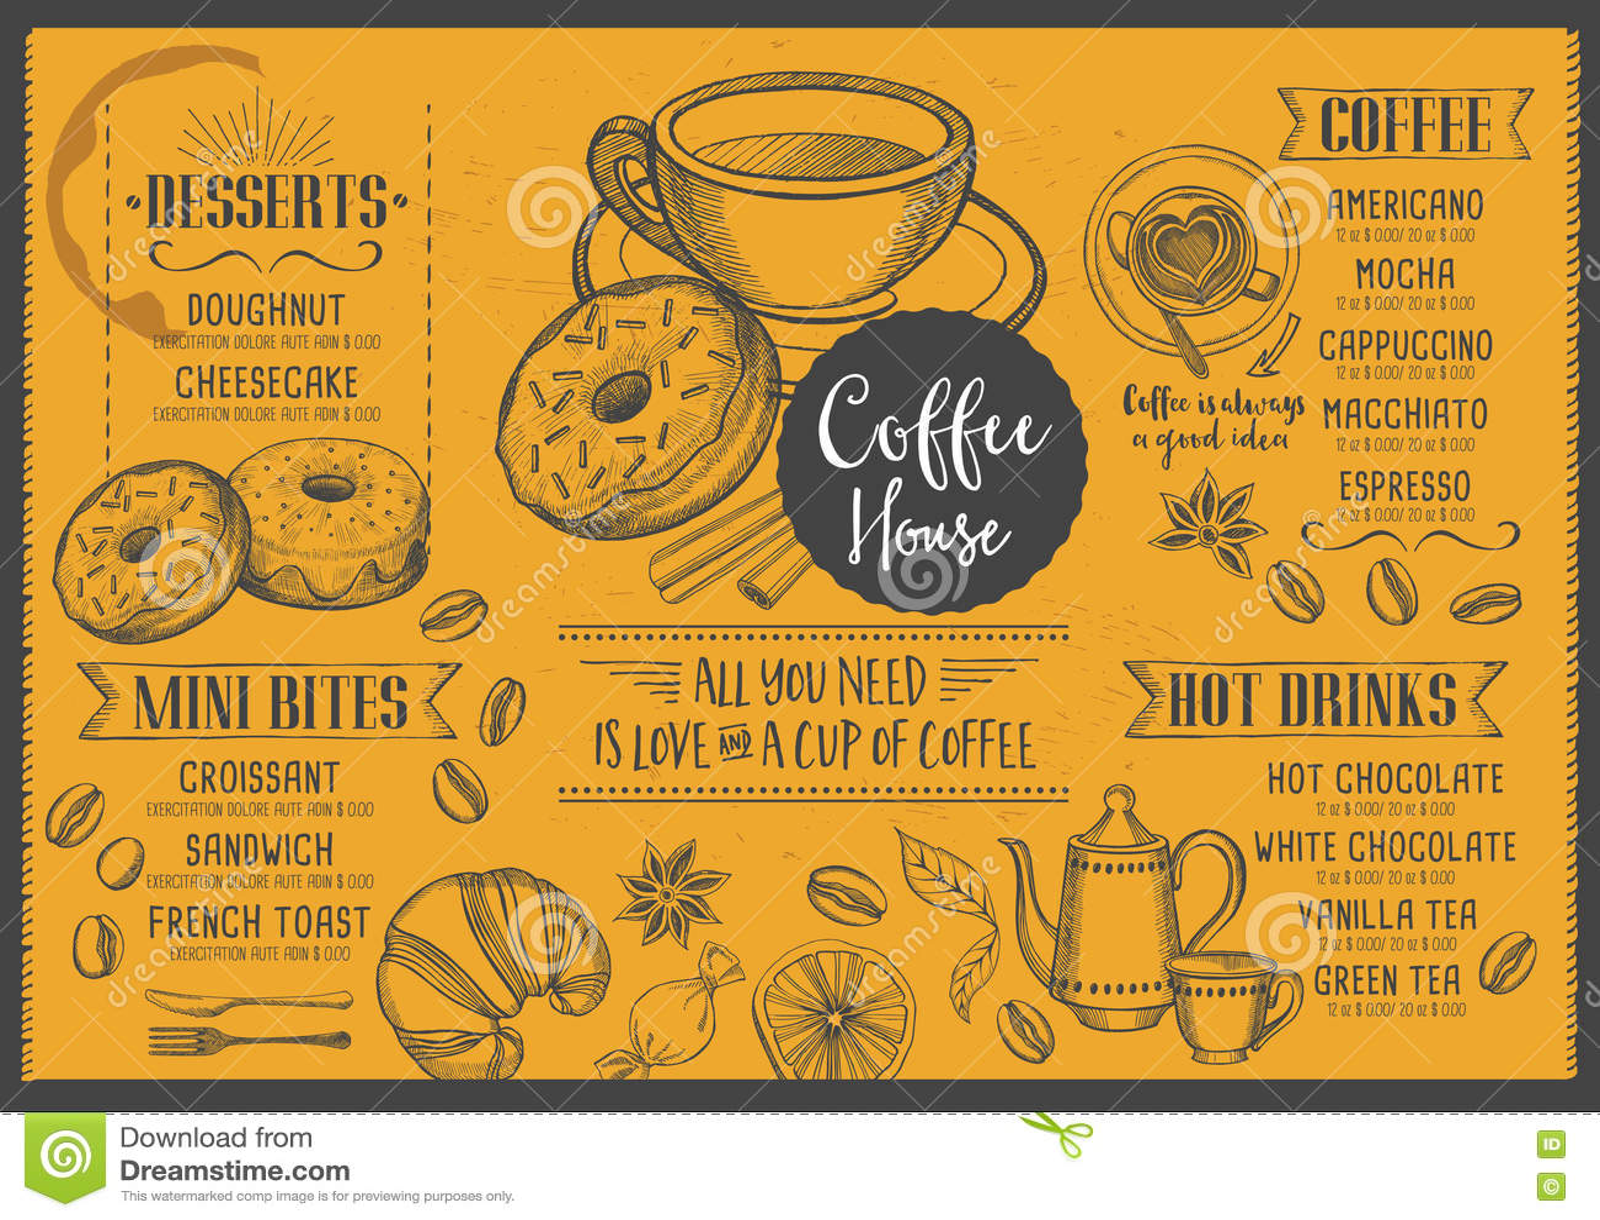 Restaurant Brochure Vector, Coffee Shop